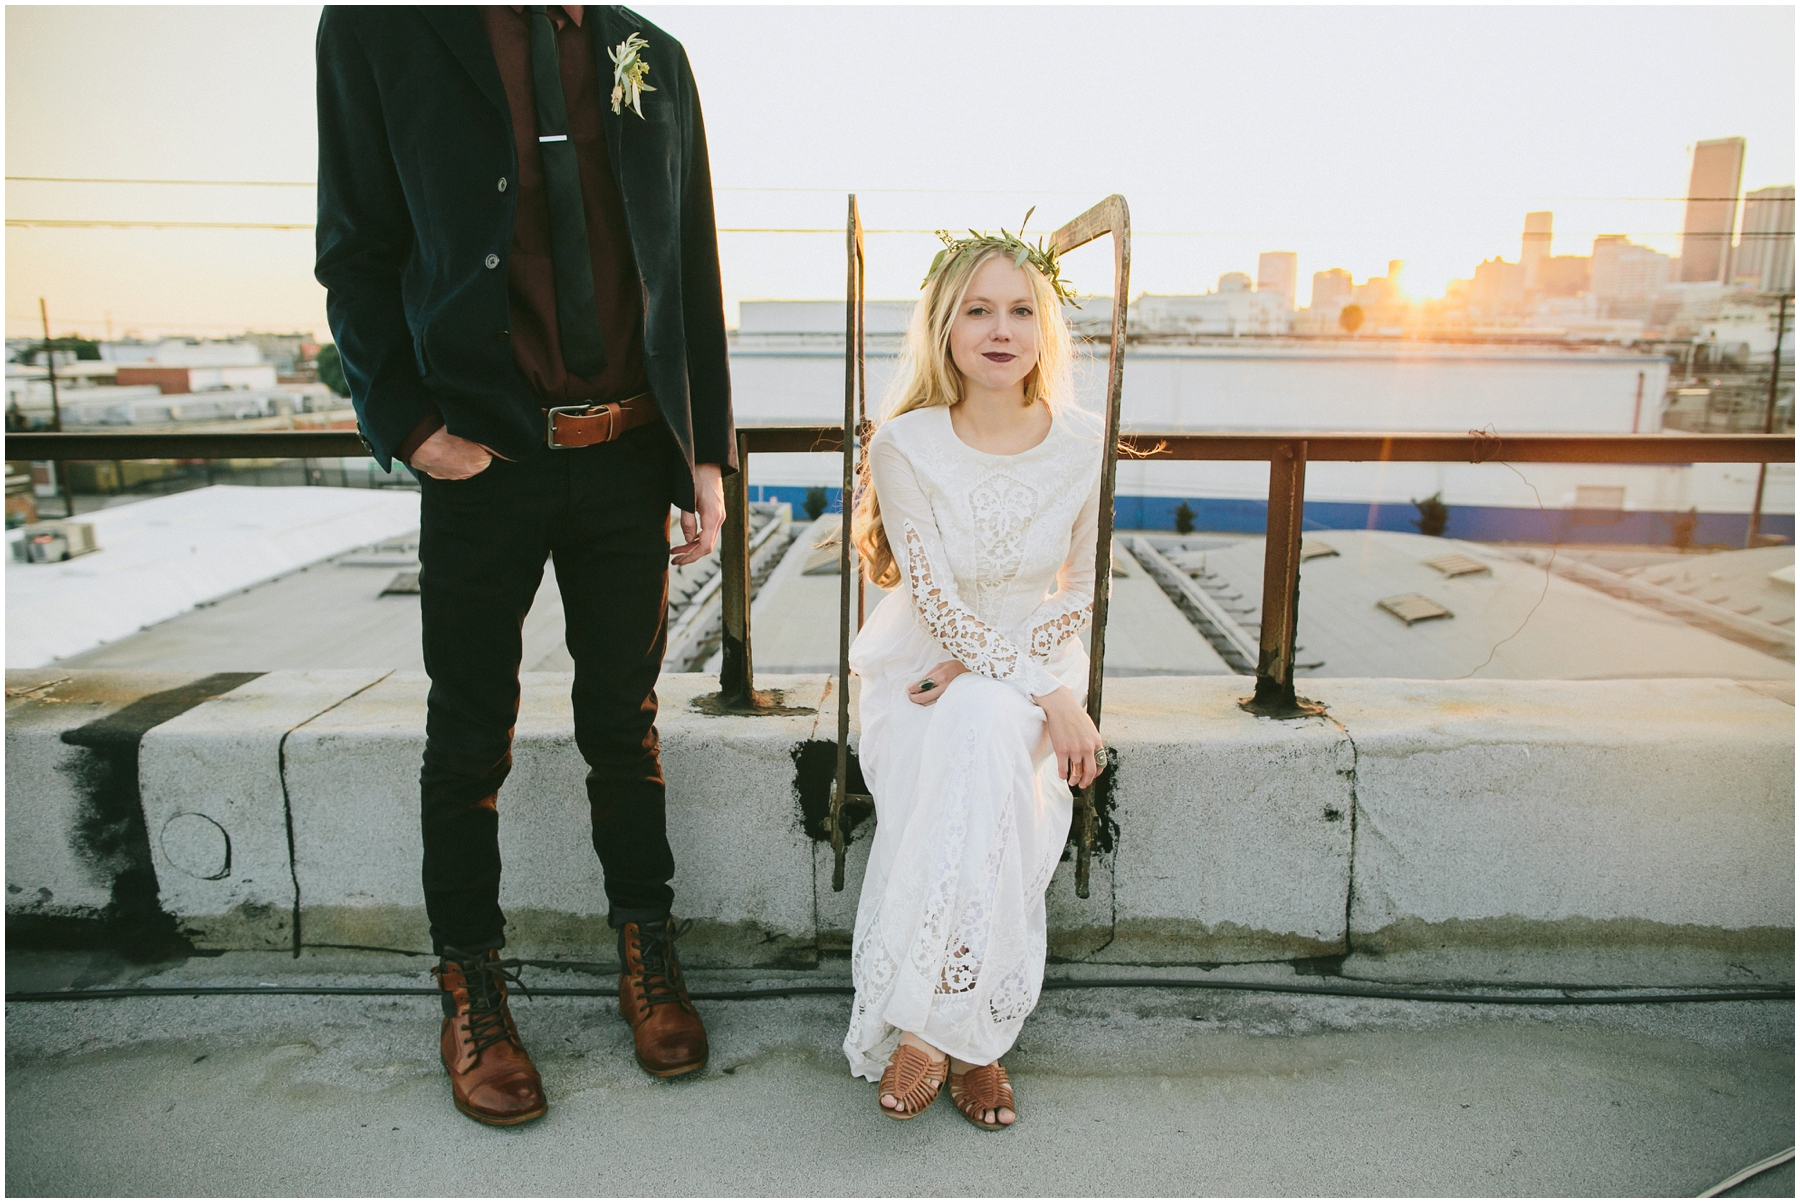 Natalie+Corey-WEDDING_KELLYBOITANO_0113